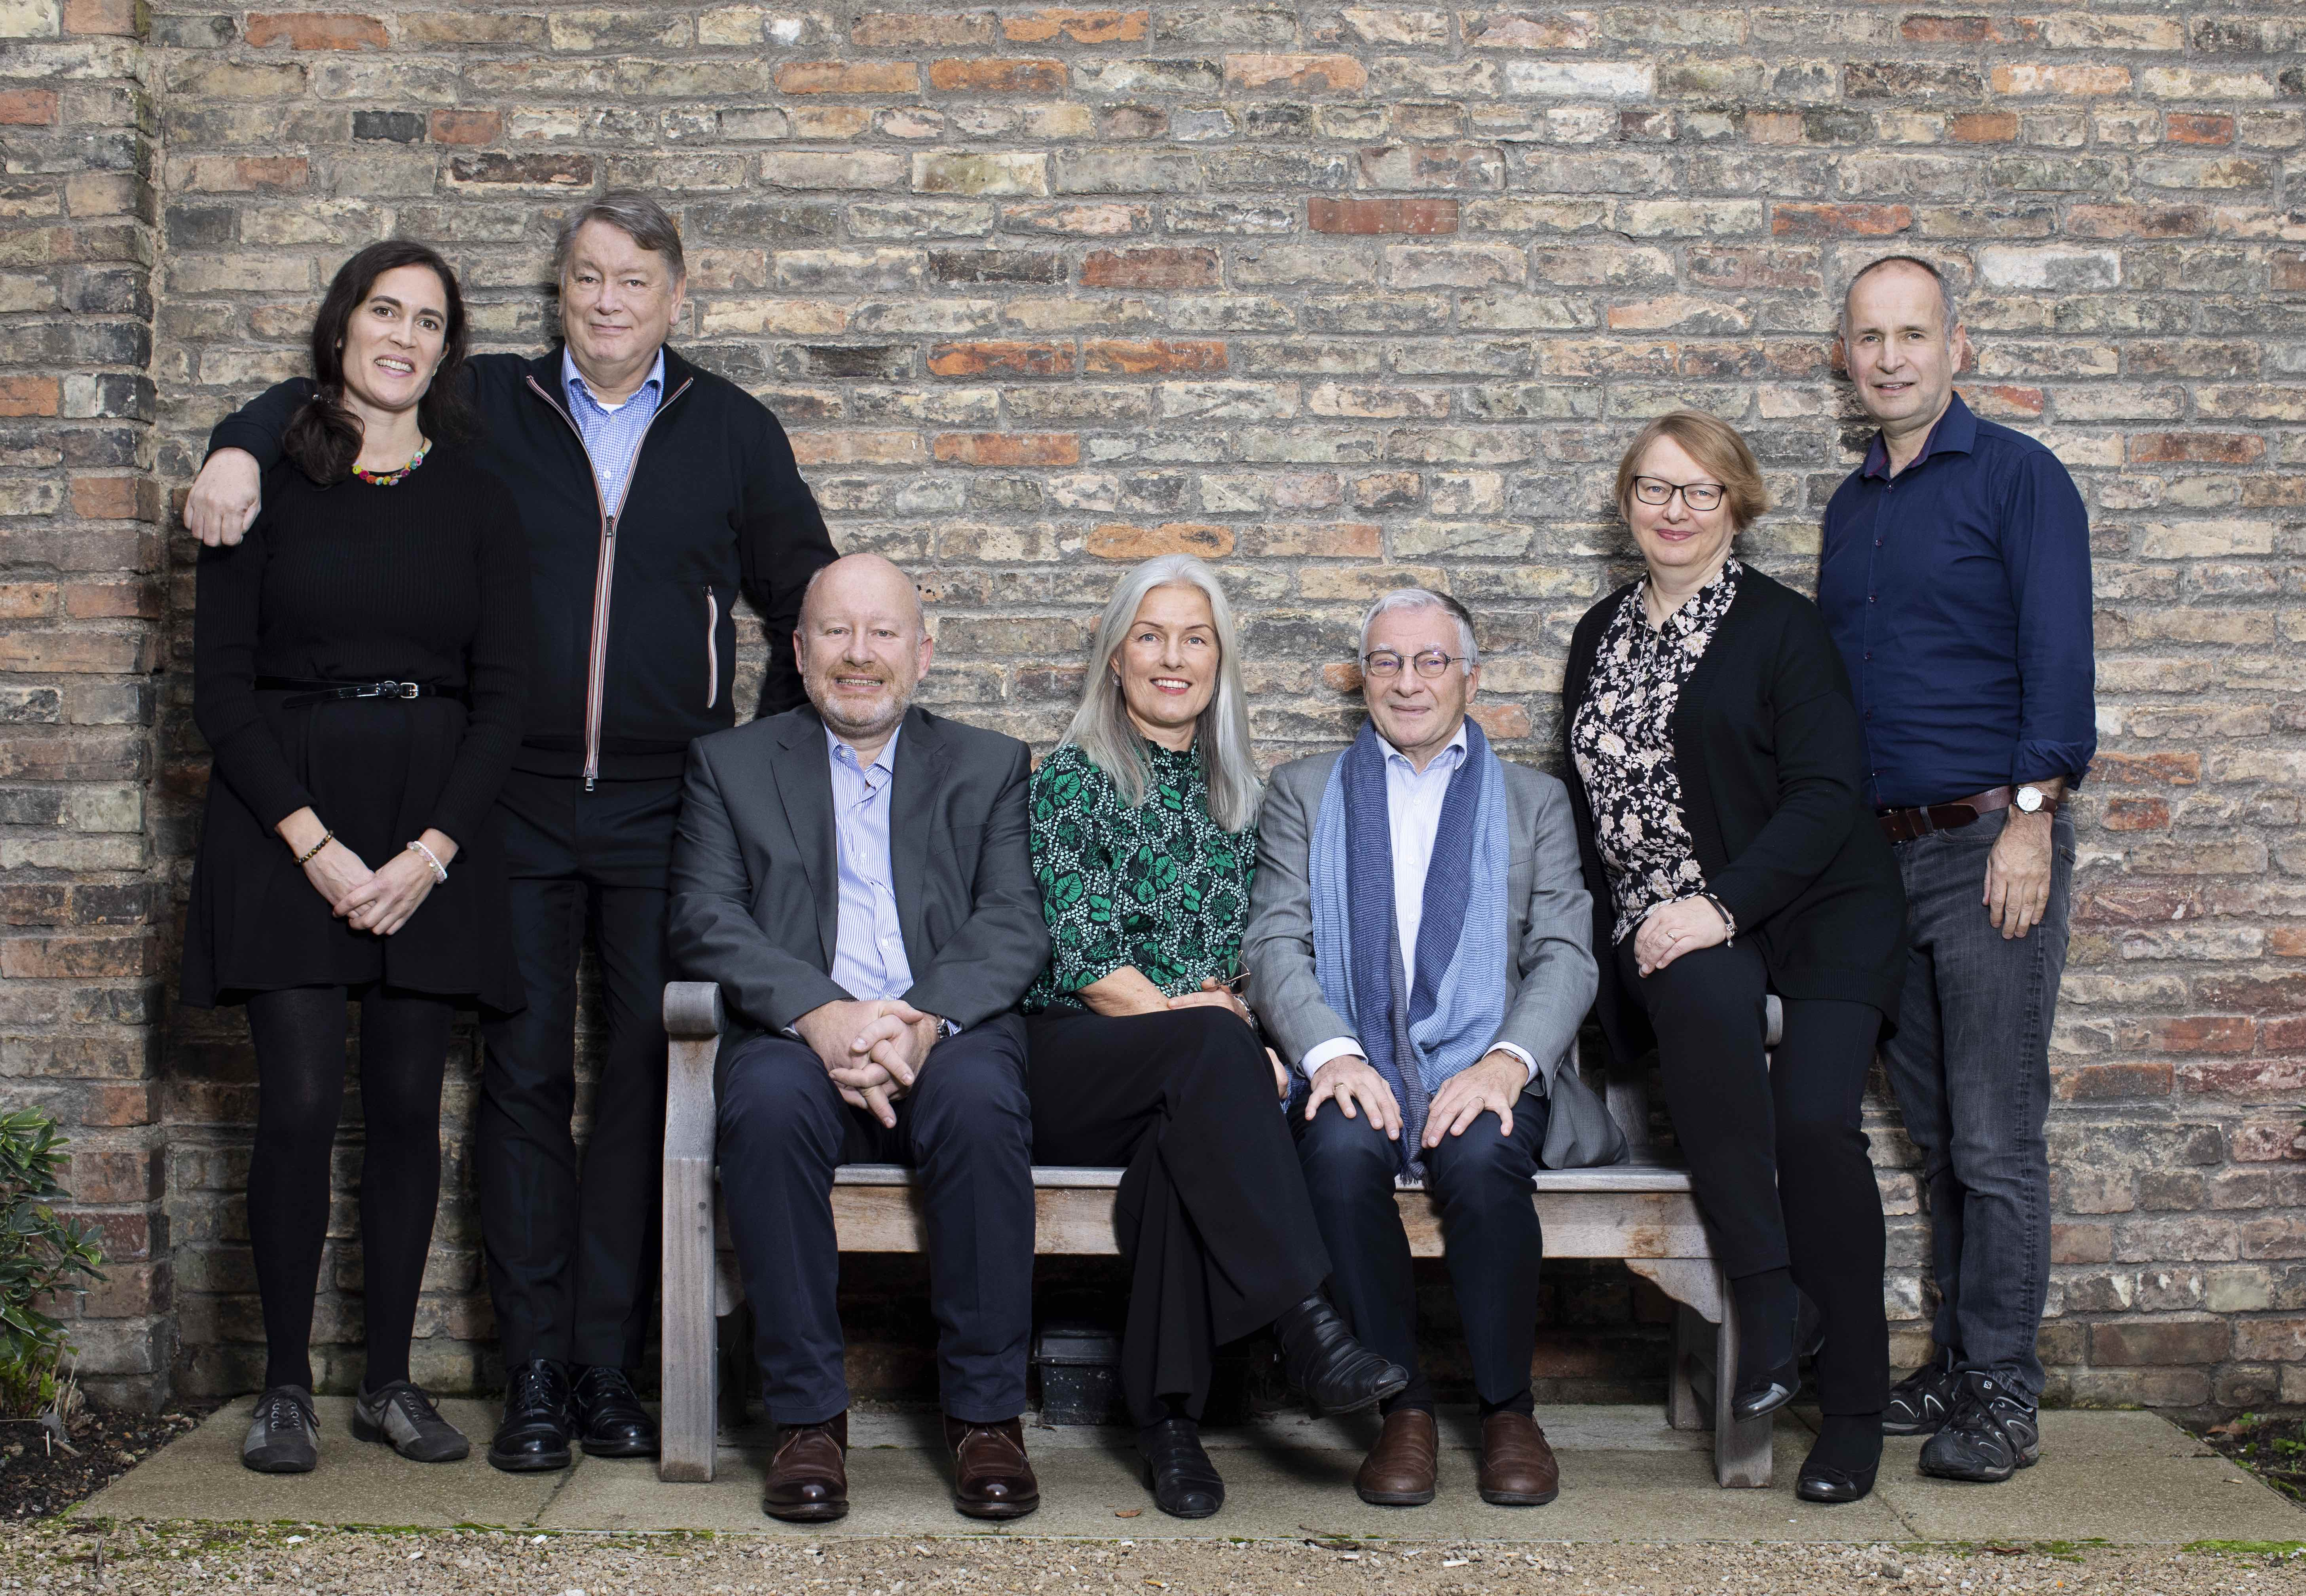 Caroline Reverdy, Einar Risvik, Didier Kariger, Stina Algoston, Jacques Leignel, Arja Lyytikäinen, Jason O'Rourke